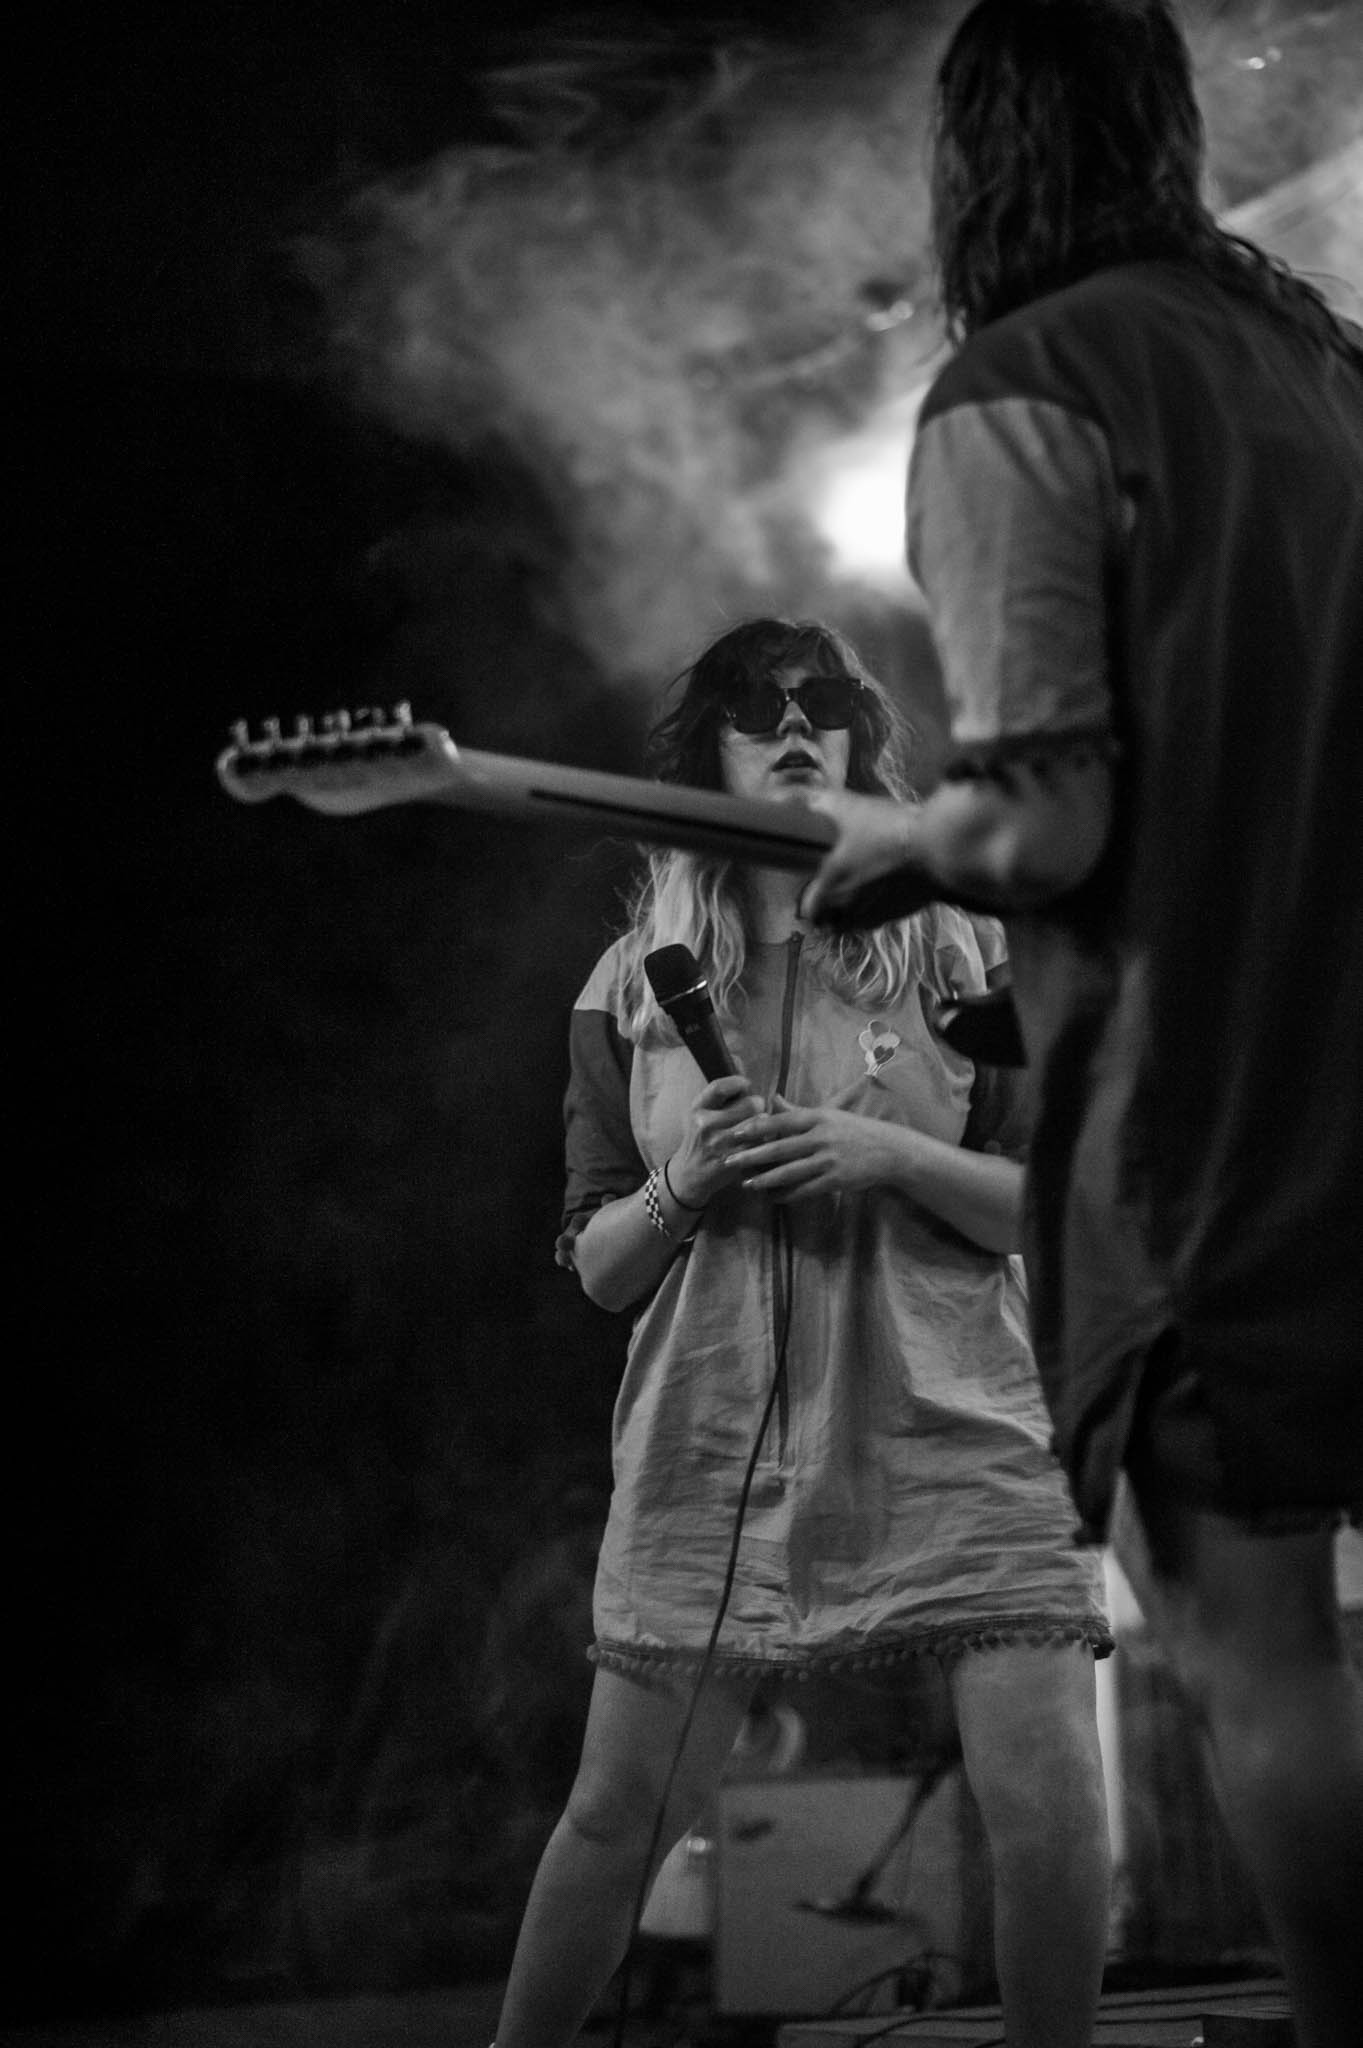 Karen Meat playing Grey Area 2018 at Flat Black Studios near Iowa City